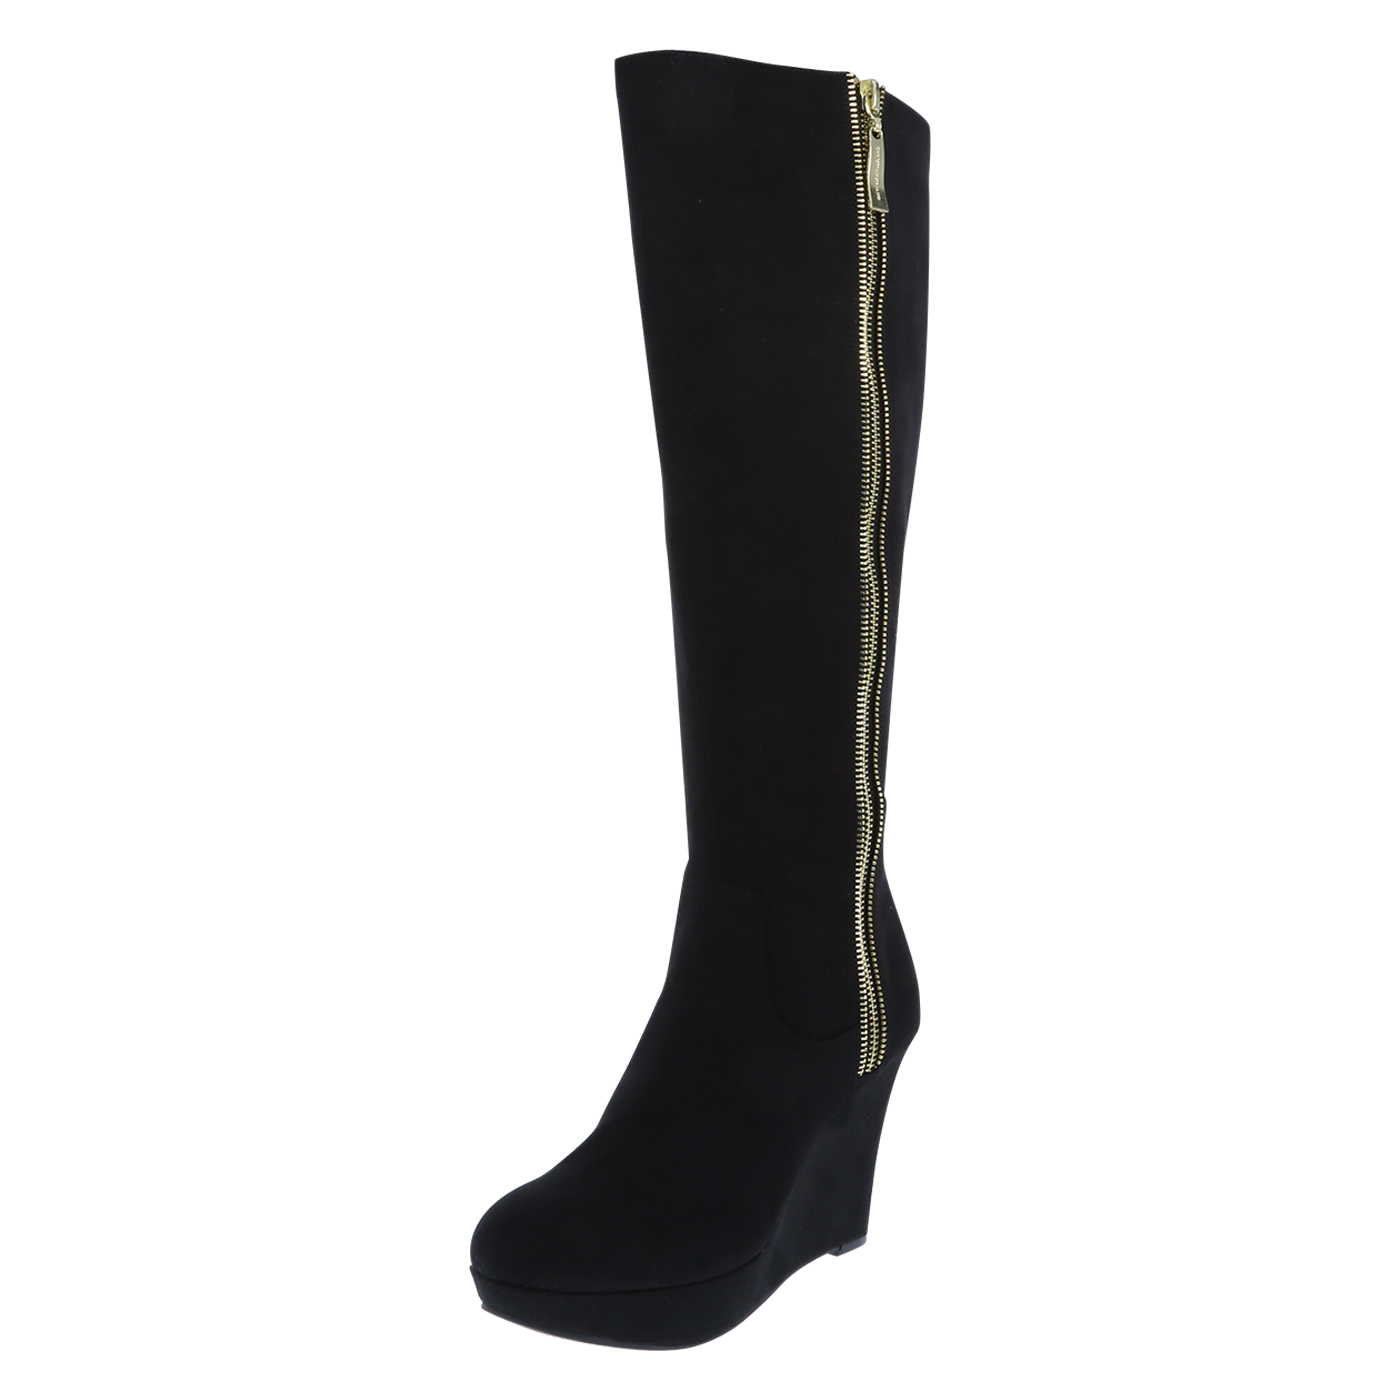 Christian Siriano Xander Tall Wedge Boot, $34